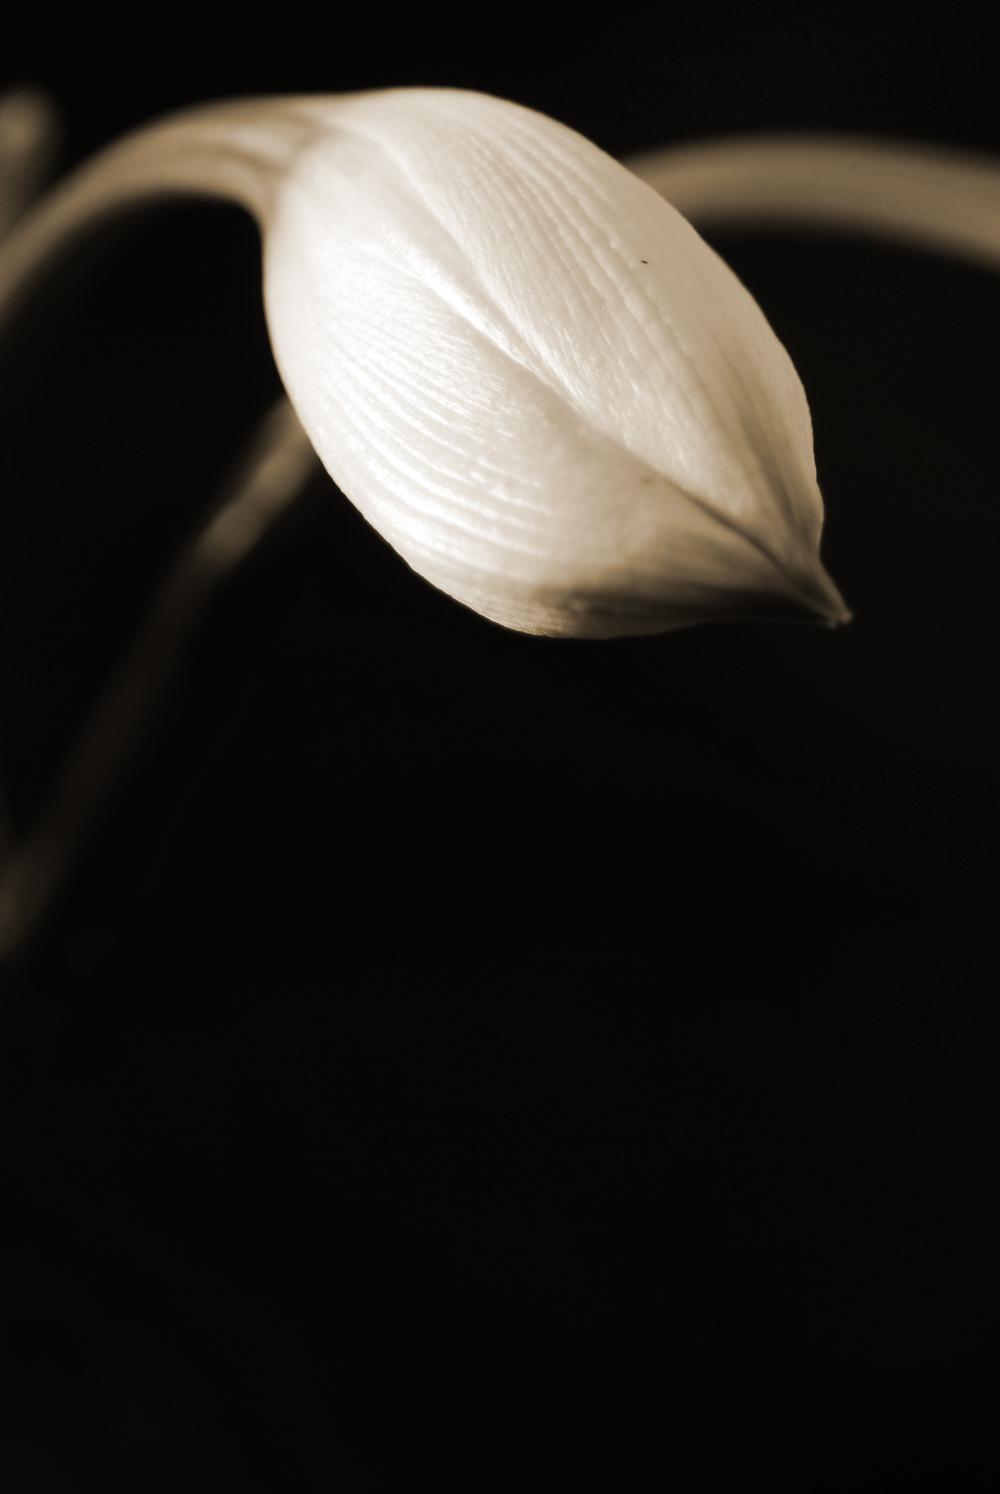 LilyClosedS.jpg